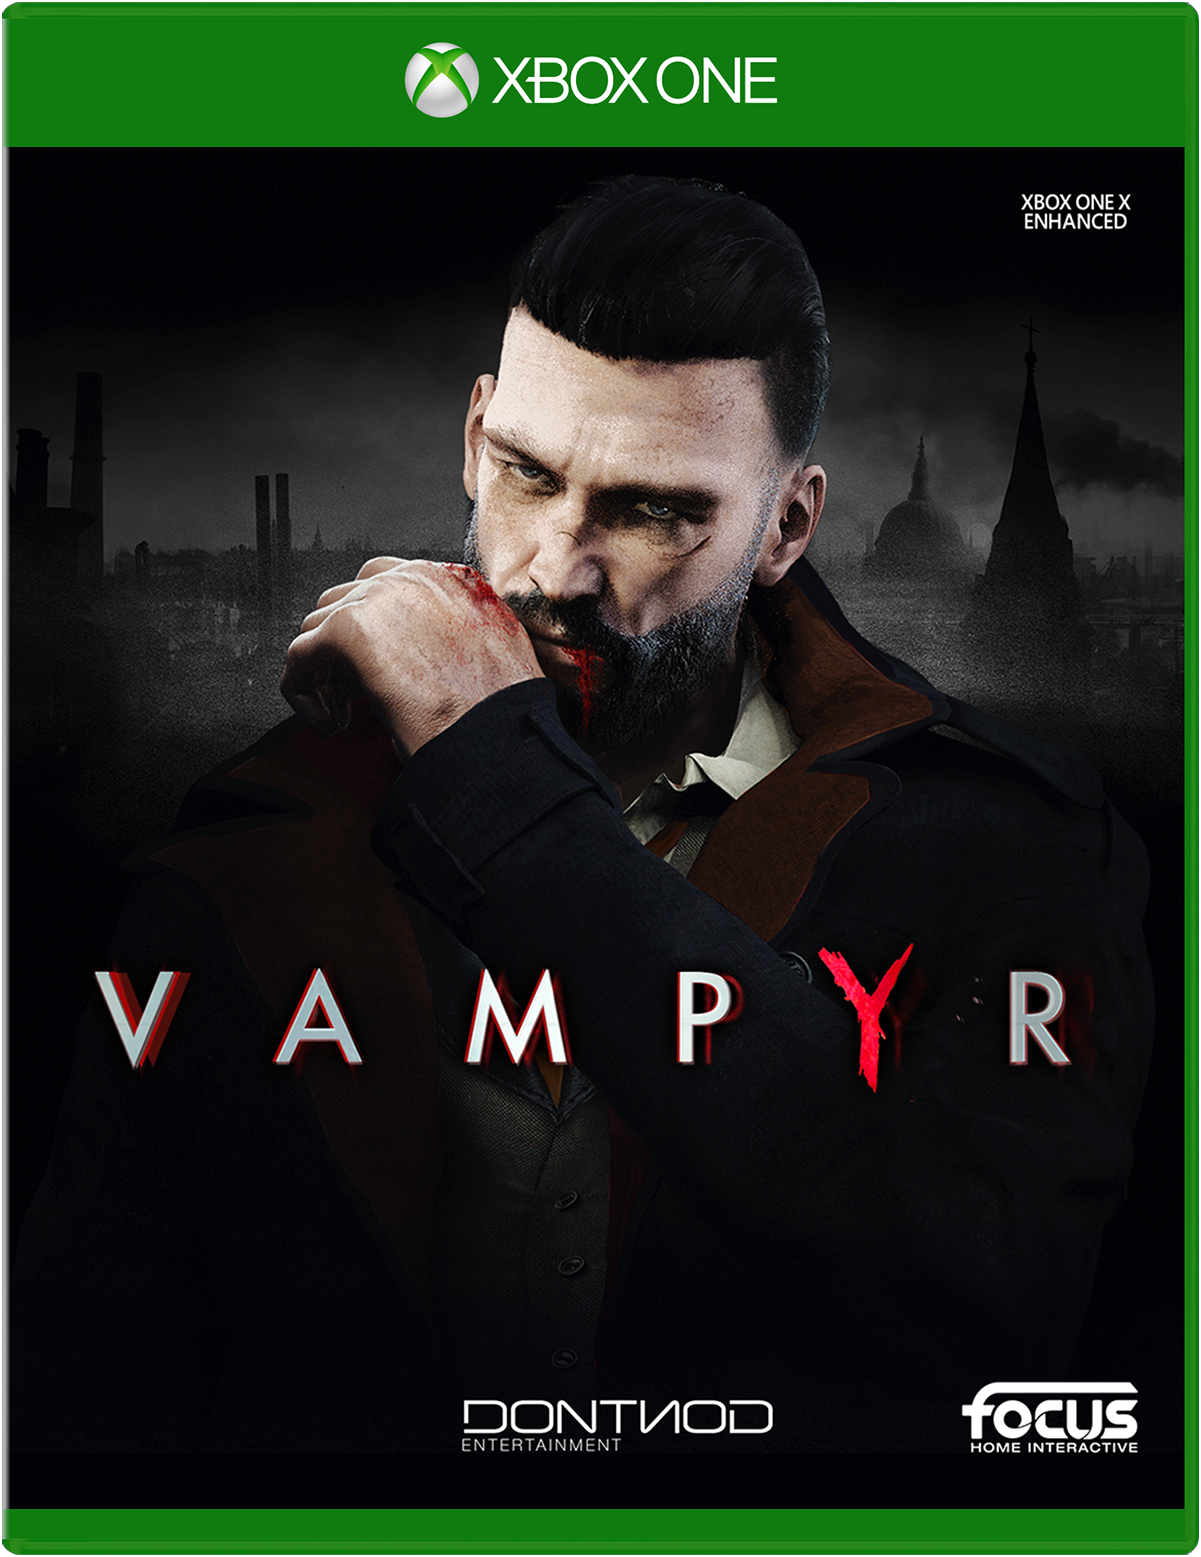 Vampyr for Xbox One